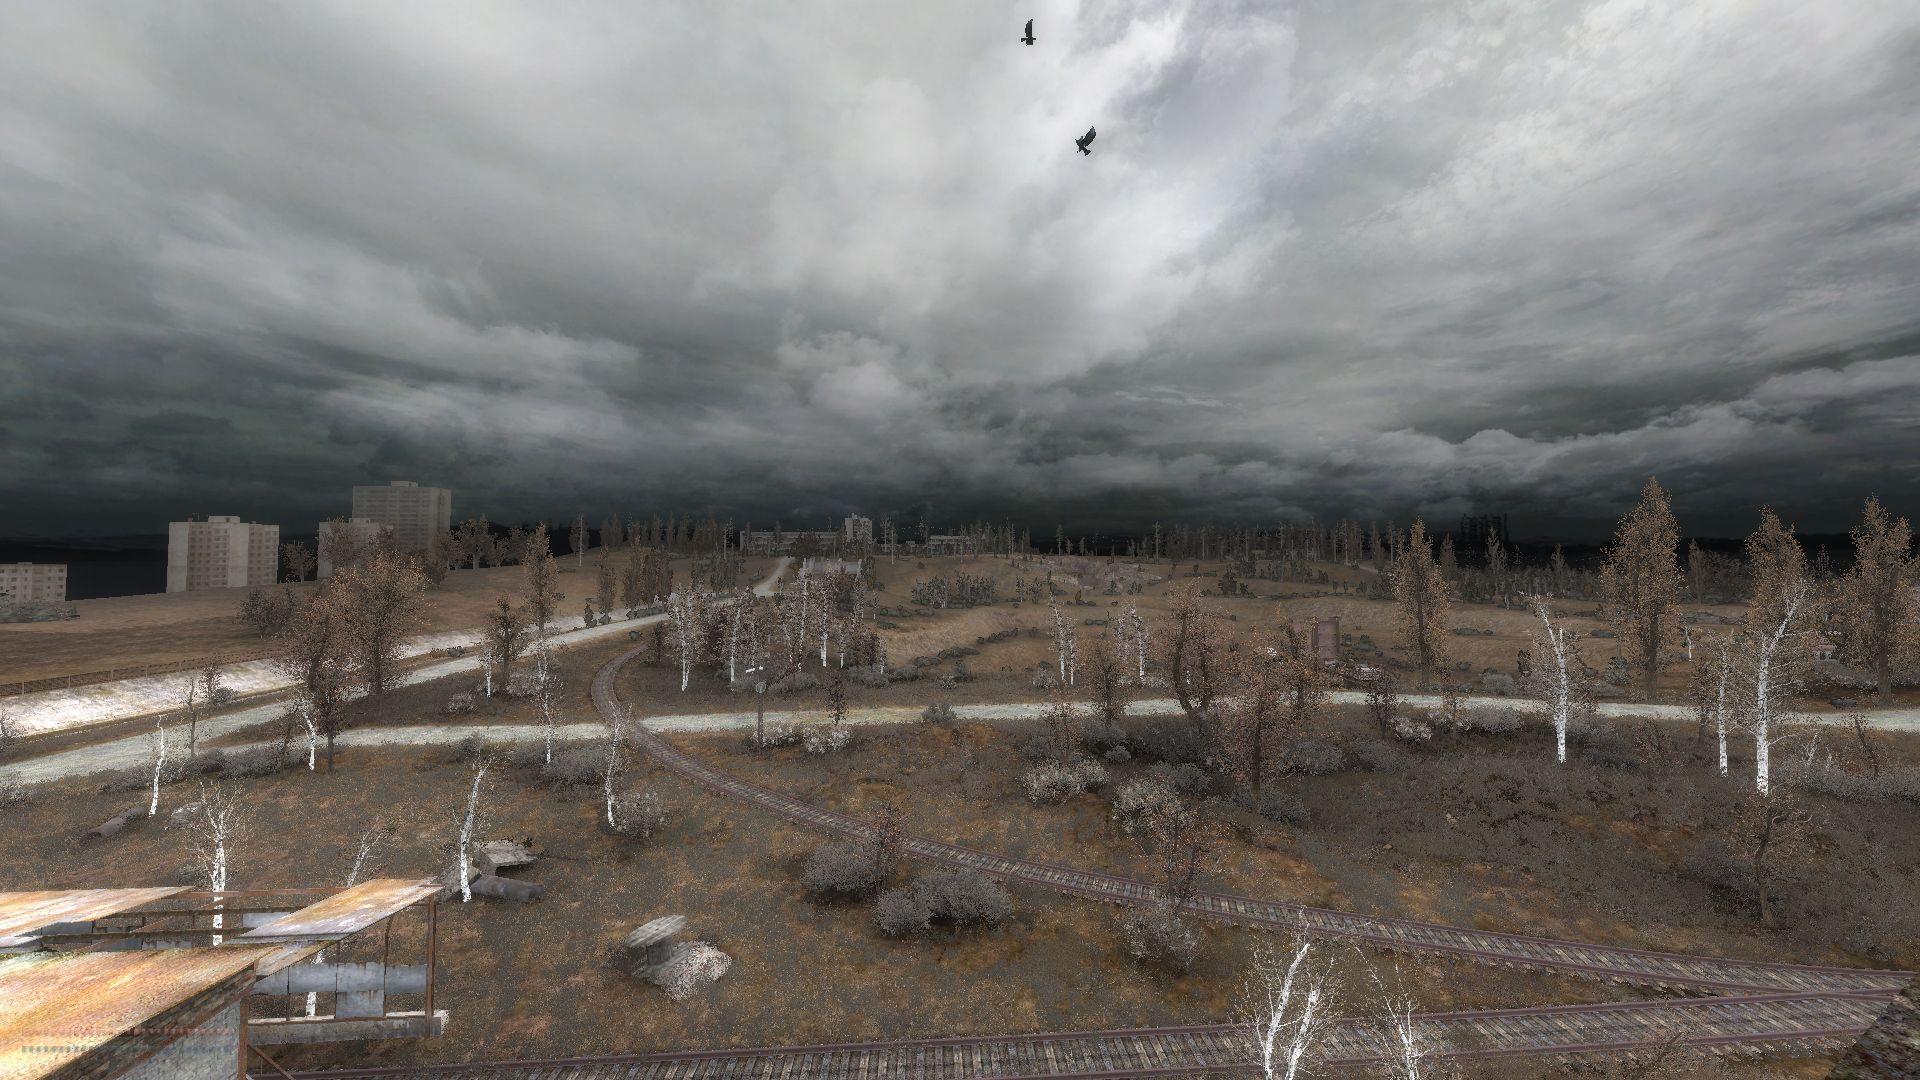 00056.Jpg - S.T.A.L.K.E.R.: Call of Pripyat